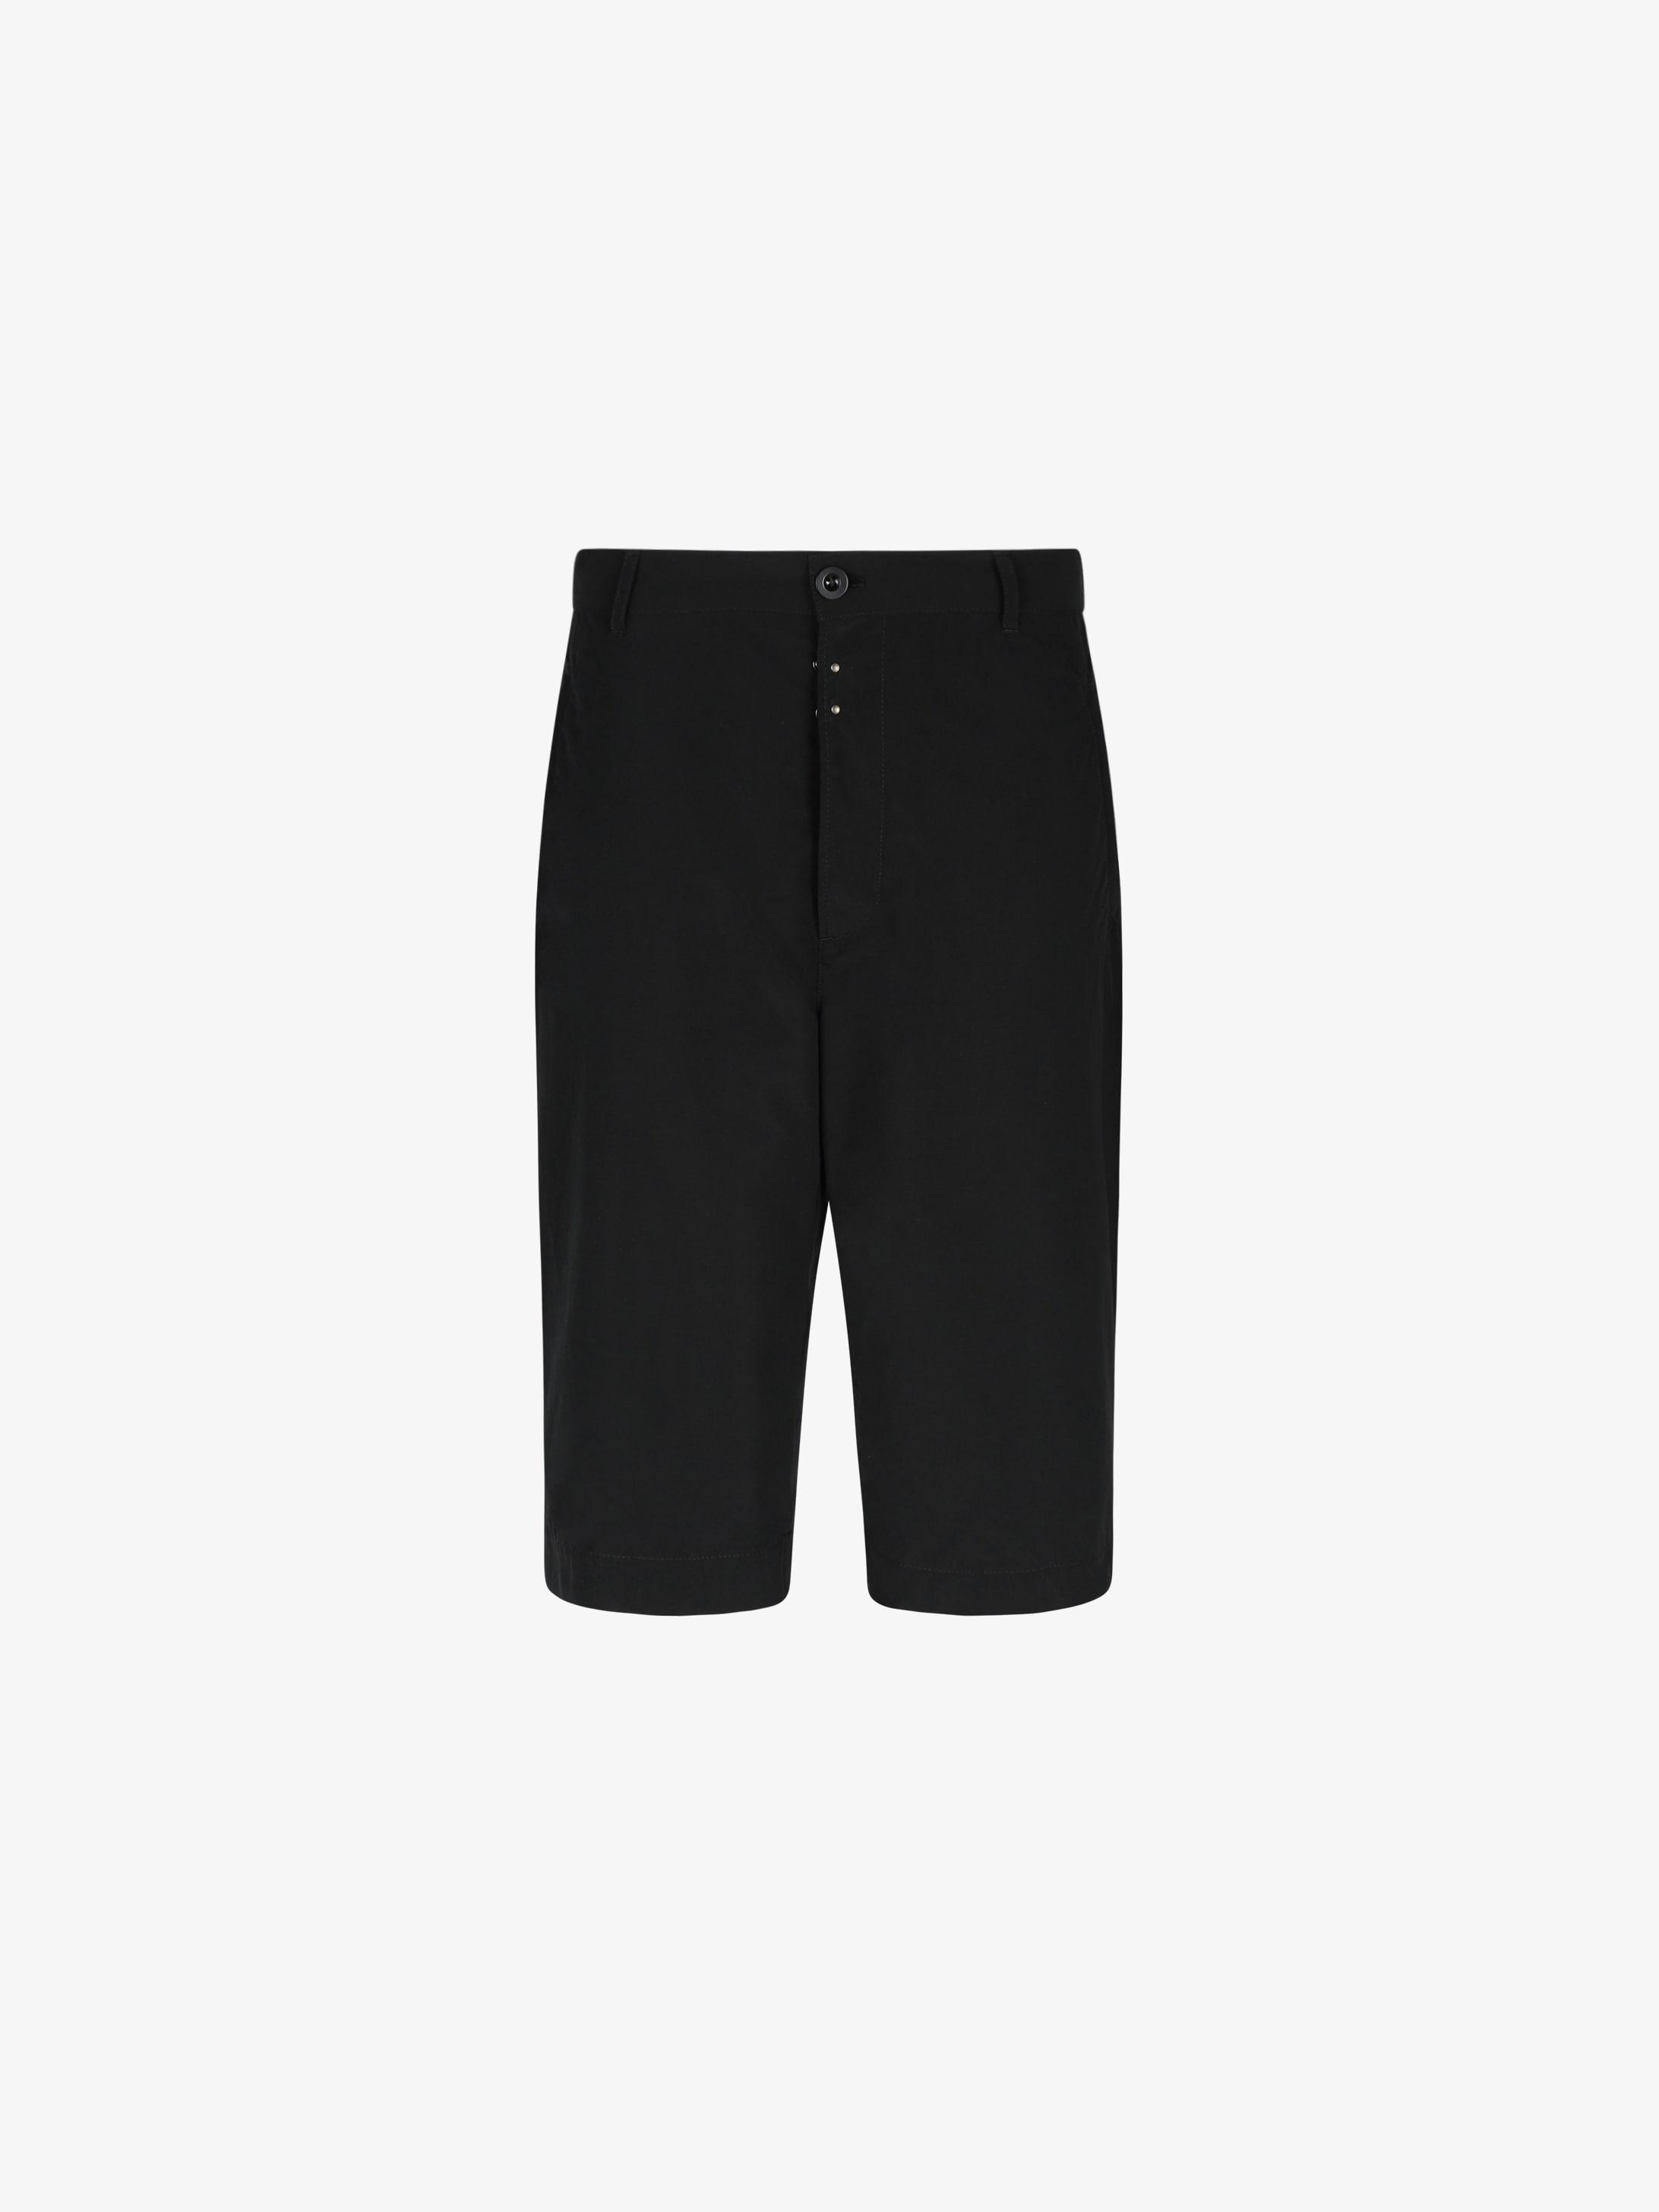 GIVENCHY PARIS饰片短裤